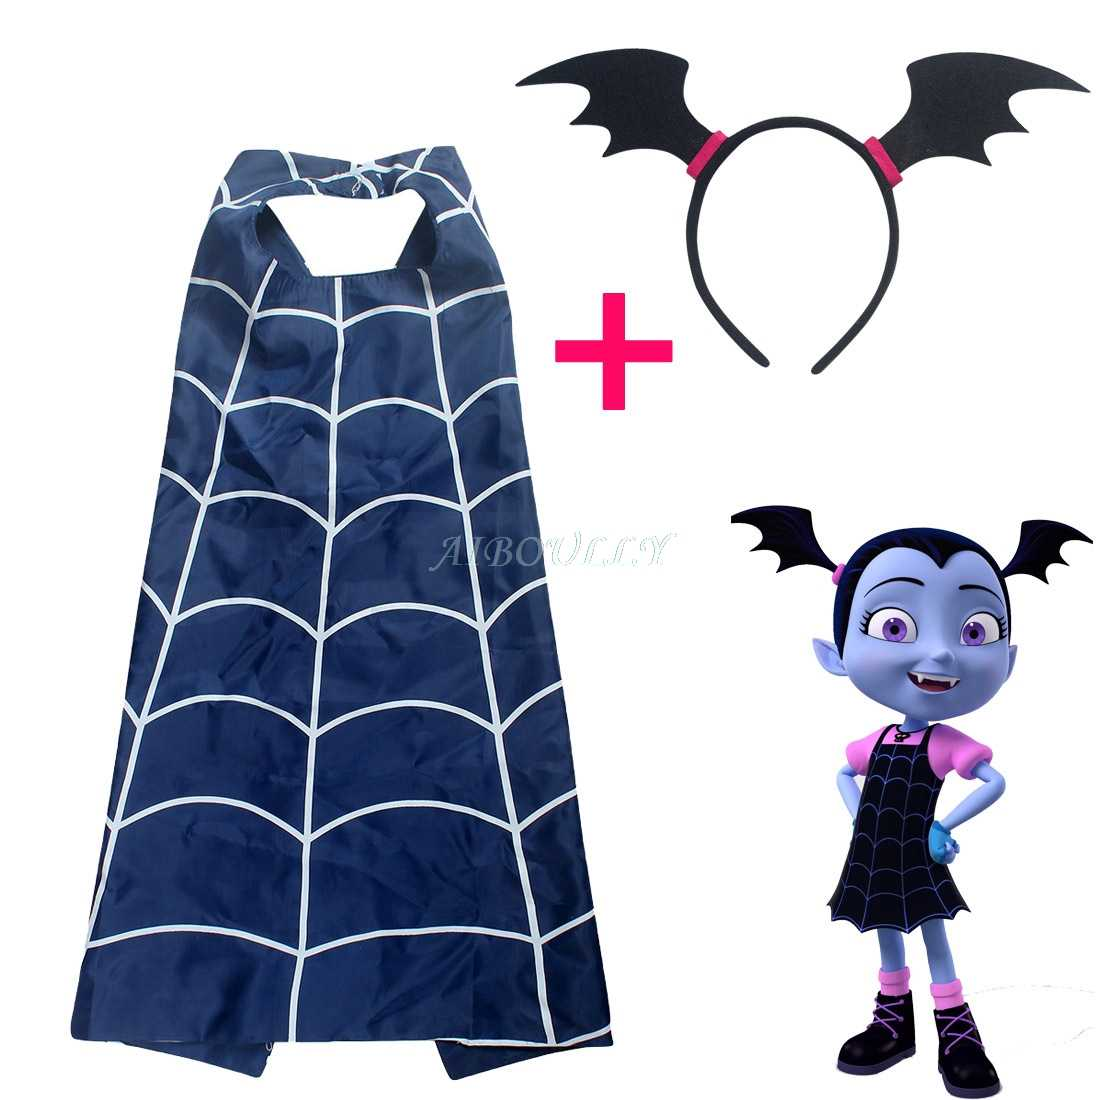 Vampirina Action Figure Toys Cosplay Kids Cartoon Cloak Cape and Mask Headband The Vamp Girl Cosplay Costumes